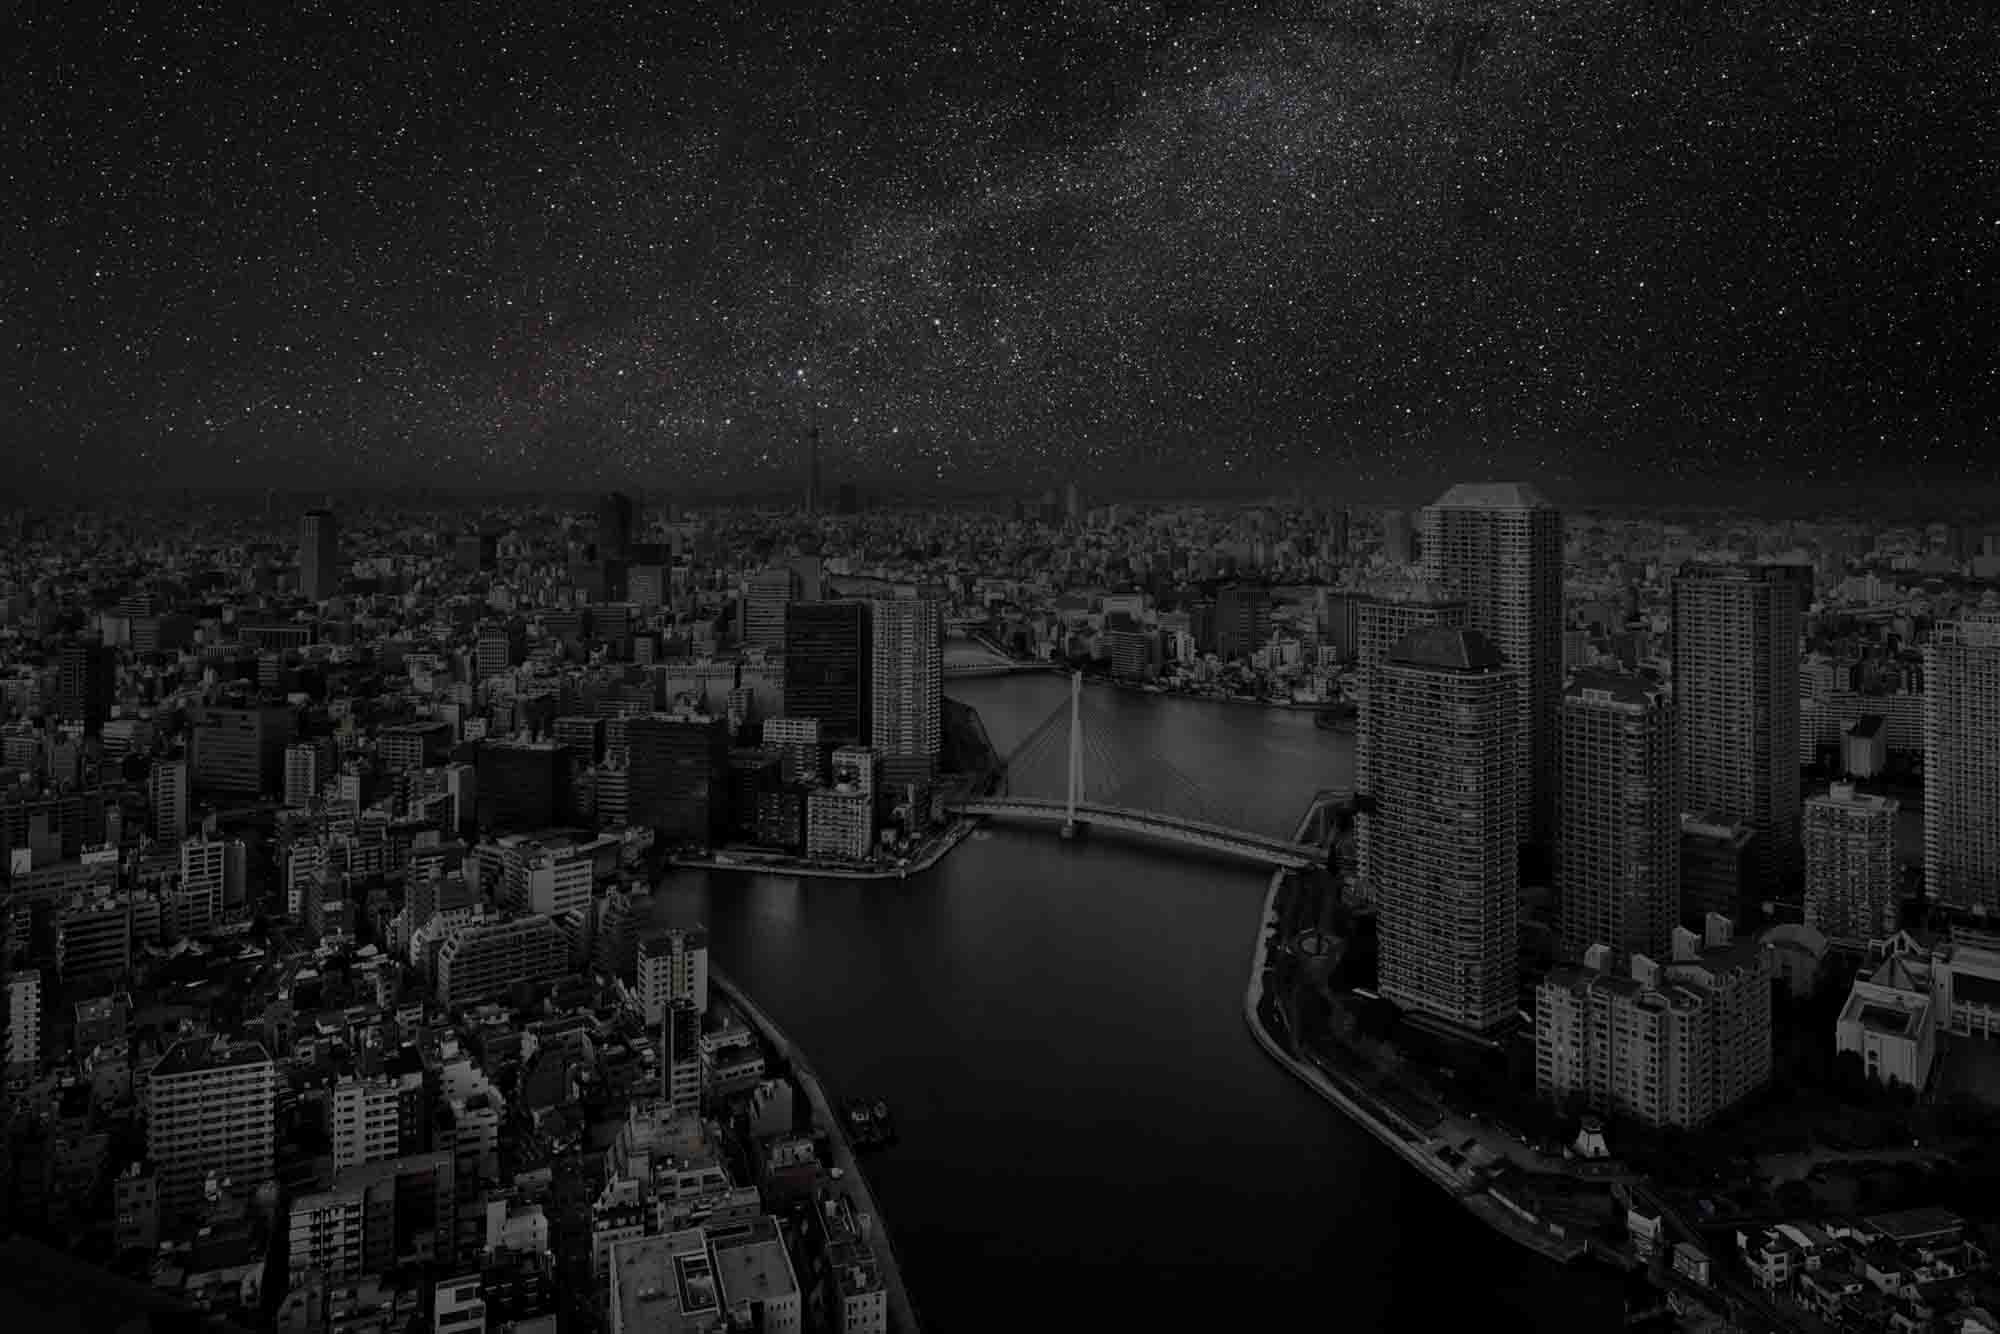 Tokyo 35° 40' 02'' N 2012-02-25 lst 15:25<br/>Darkened Cities - Villes éteintes